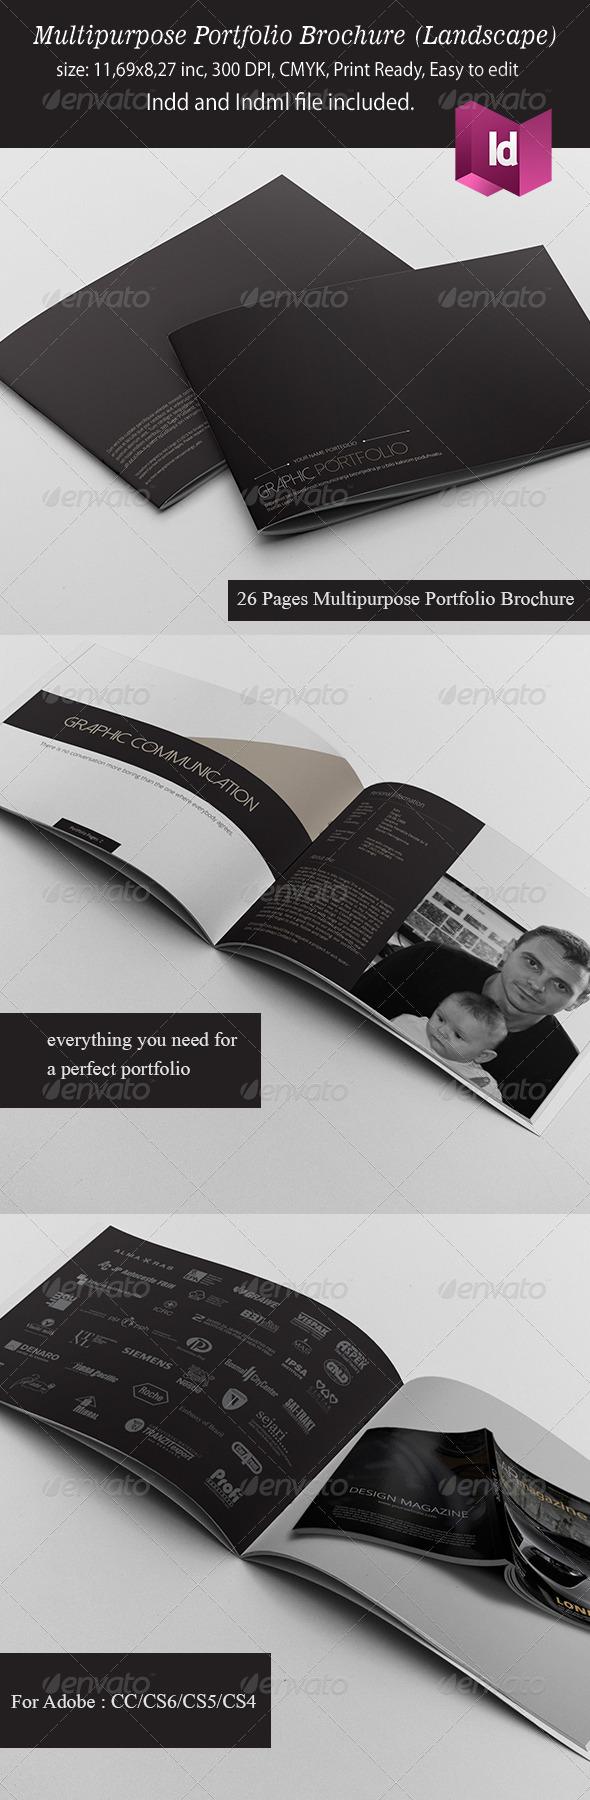 Multipurpose Portfolio Brochure Landscape Version - Portfolio Brochures